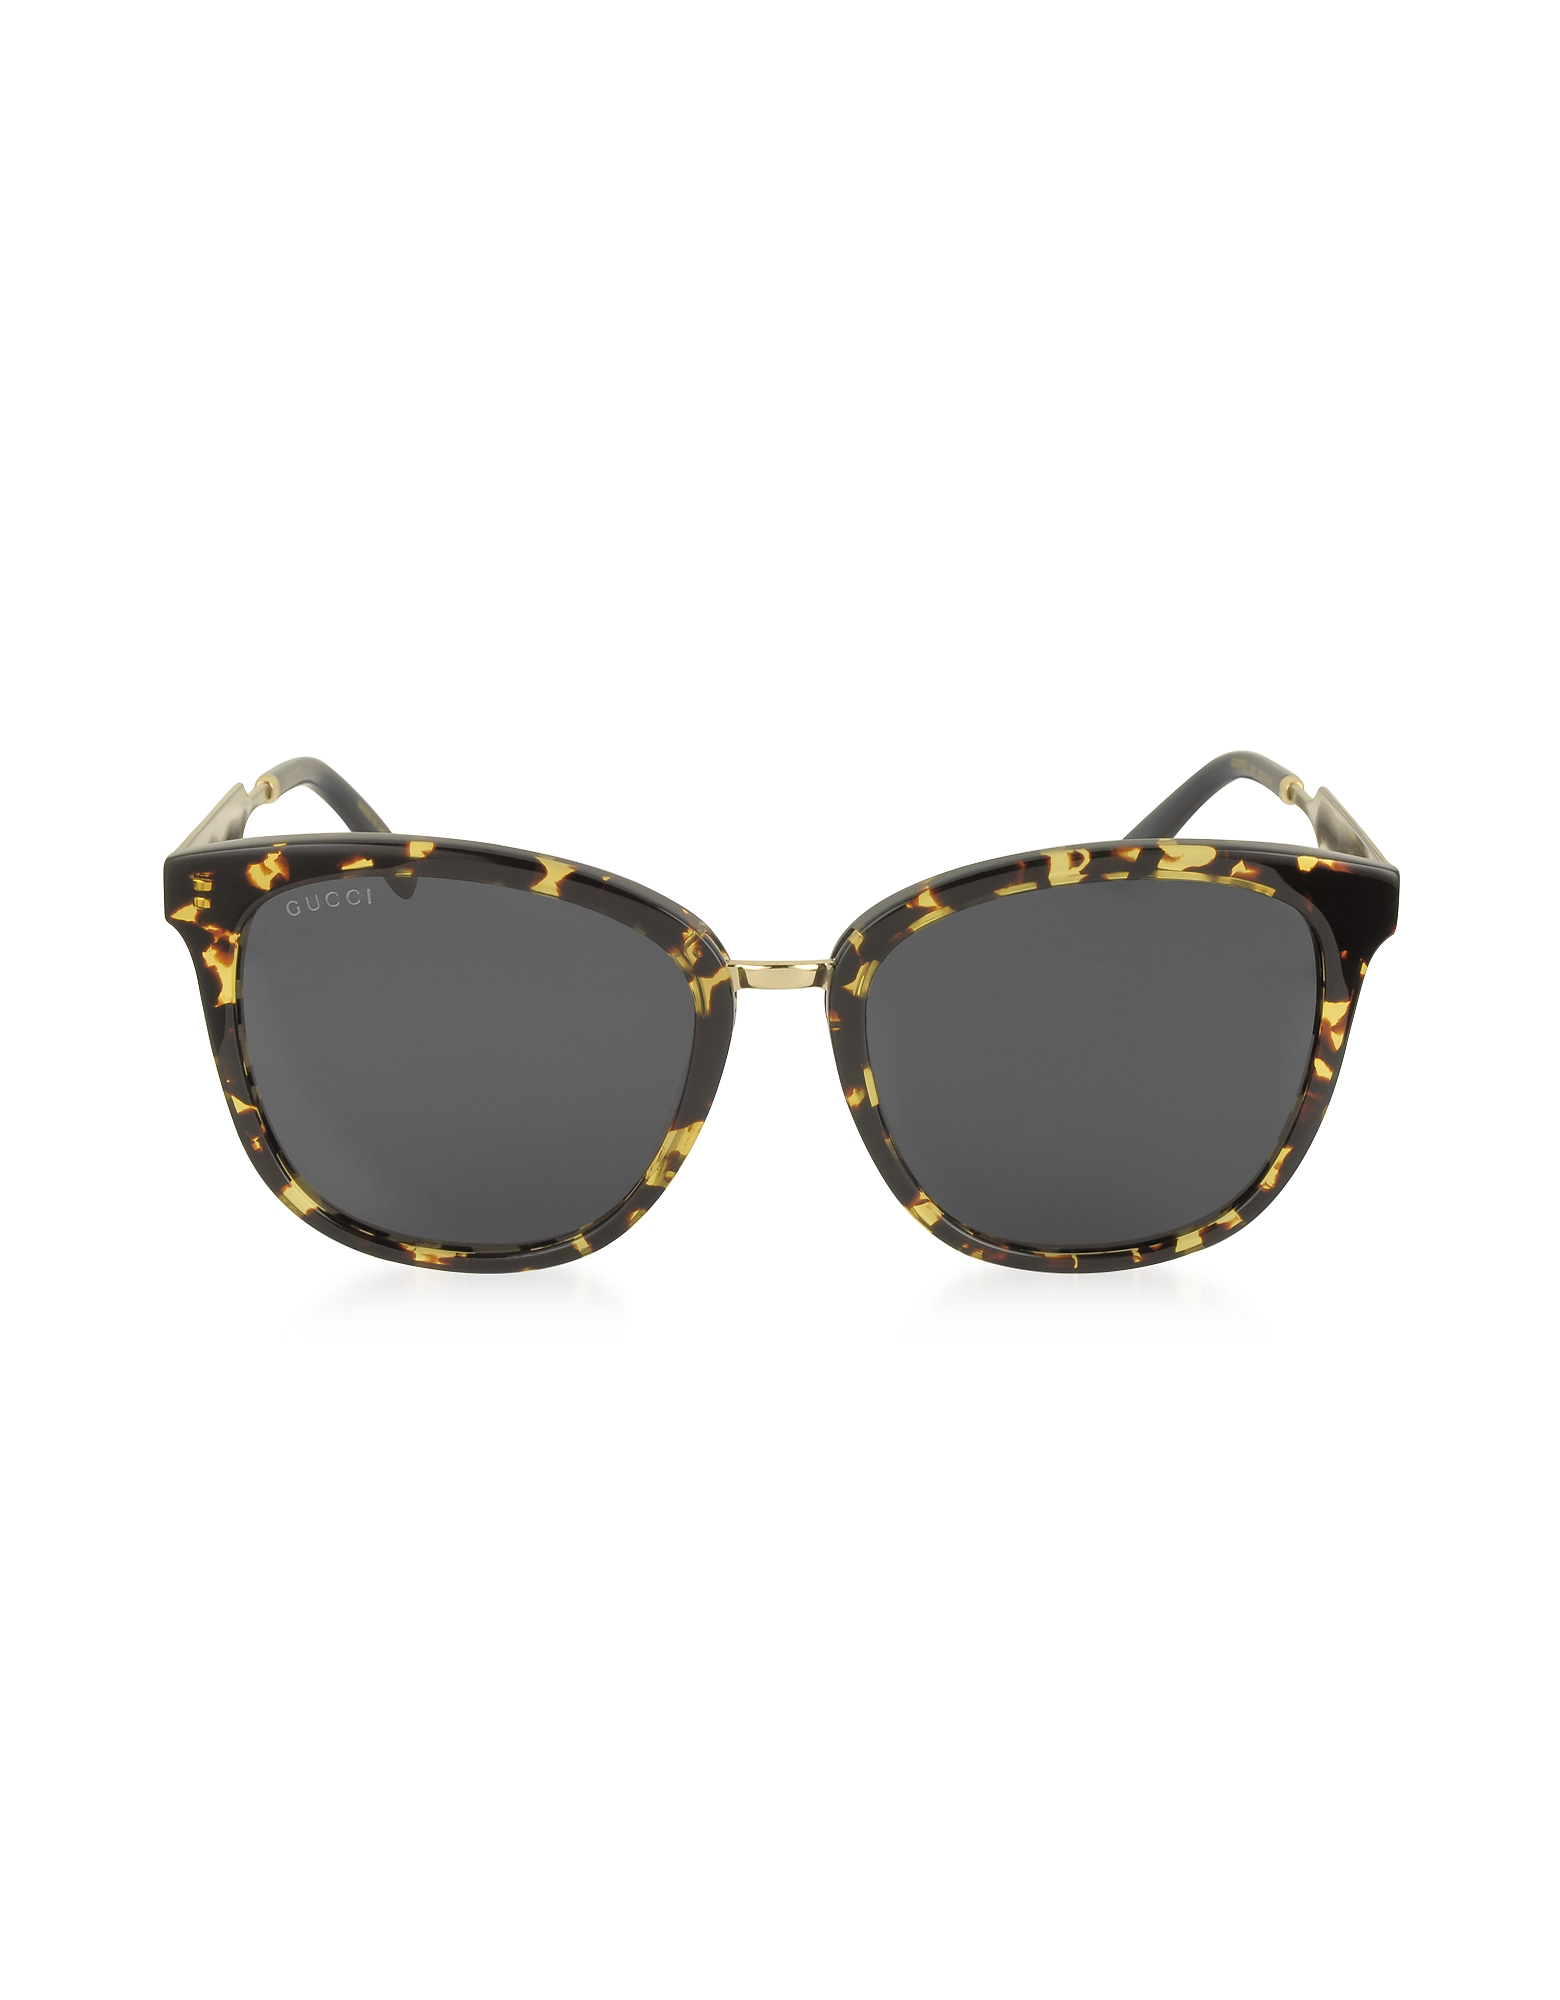 Gucci Designer Sunglasses, GG0073S Acetate and Gold Metal Round Women's Sunglasses